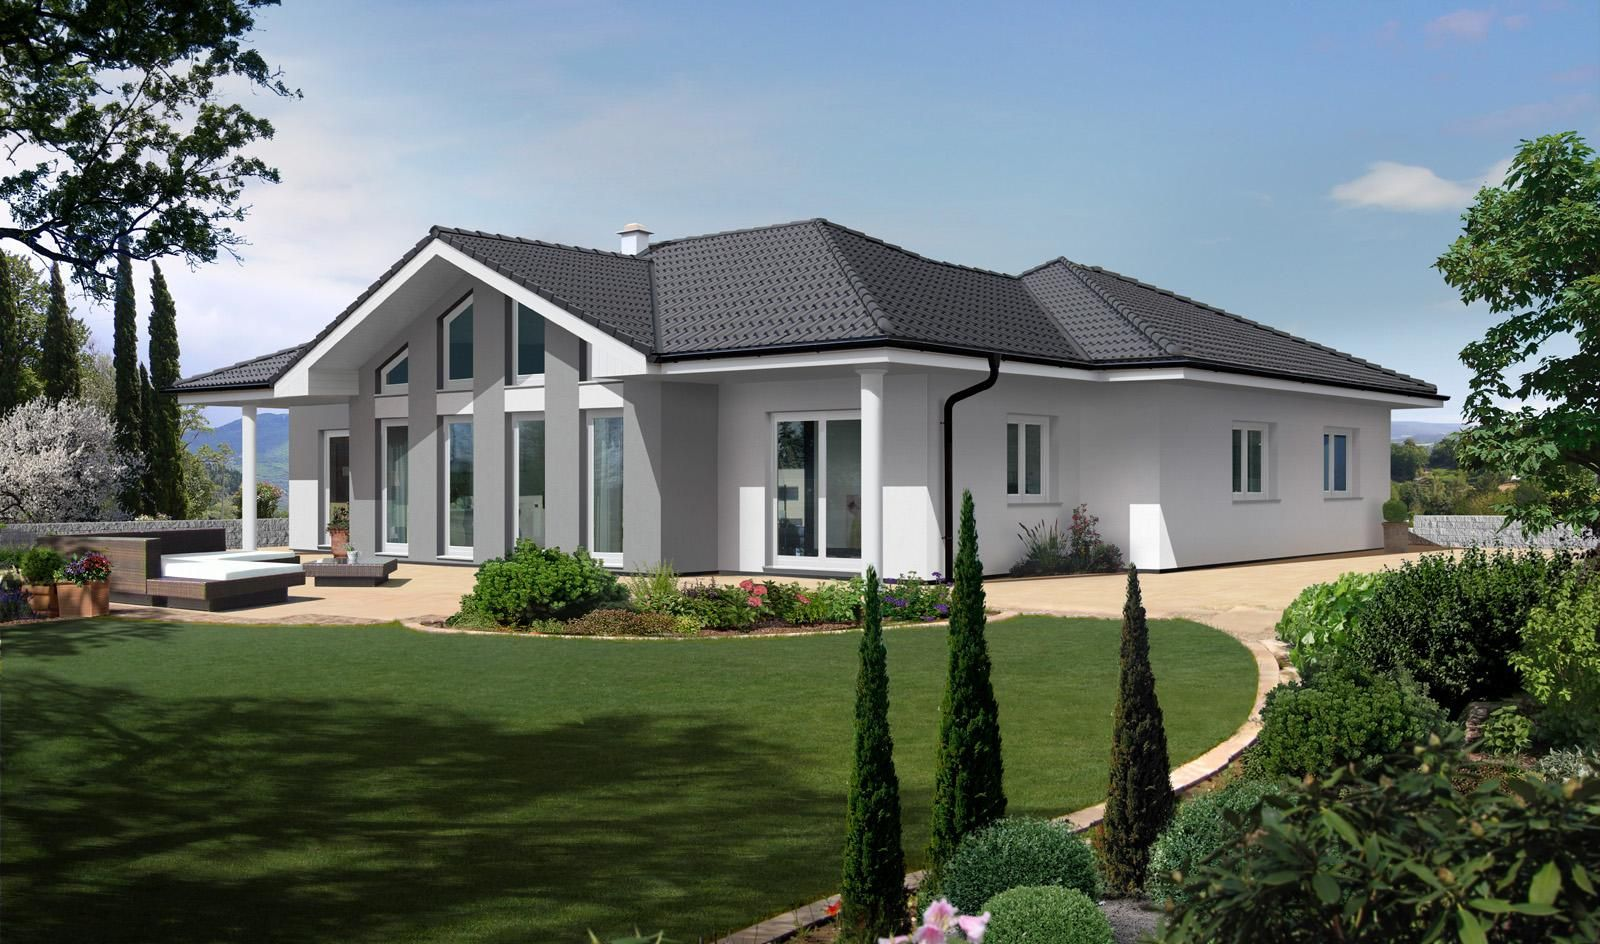 Elegance 160 w traumh user katalog pinterest for Haus bauen katalog